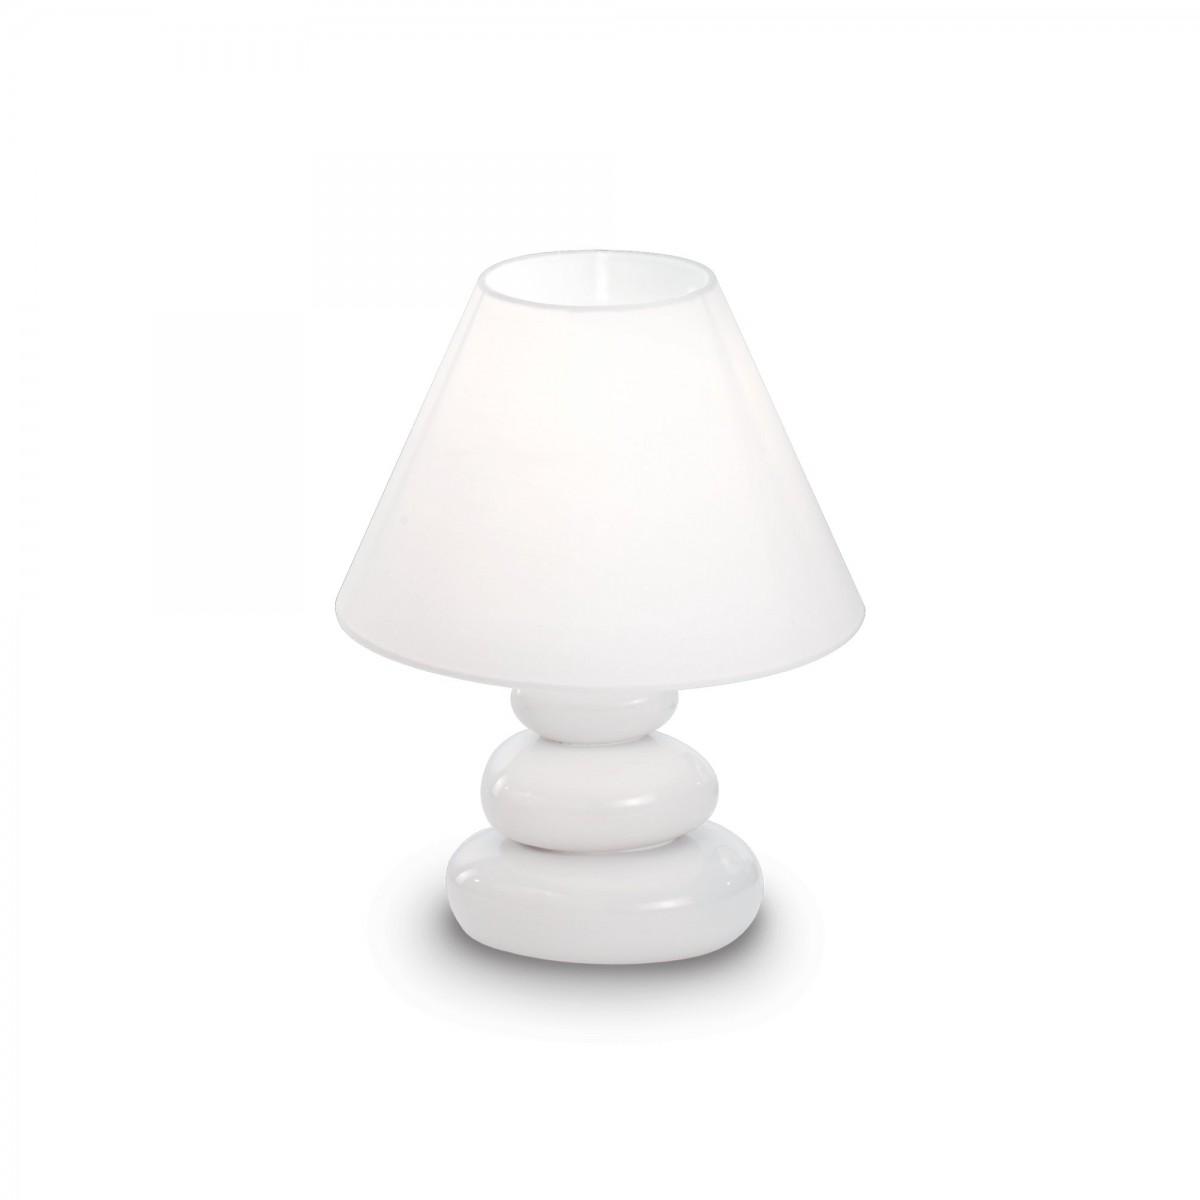 stolní lampa Ideal lux K2 TL1 035093 1x40W E14 - designová keramika